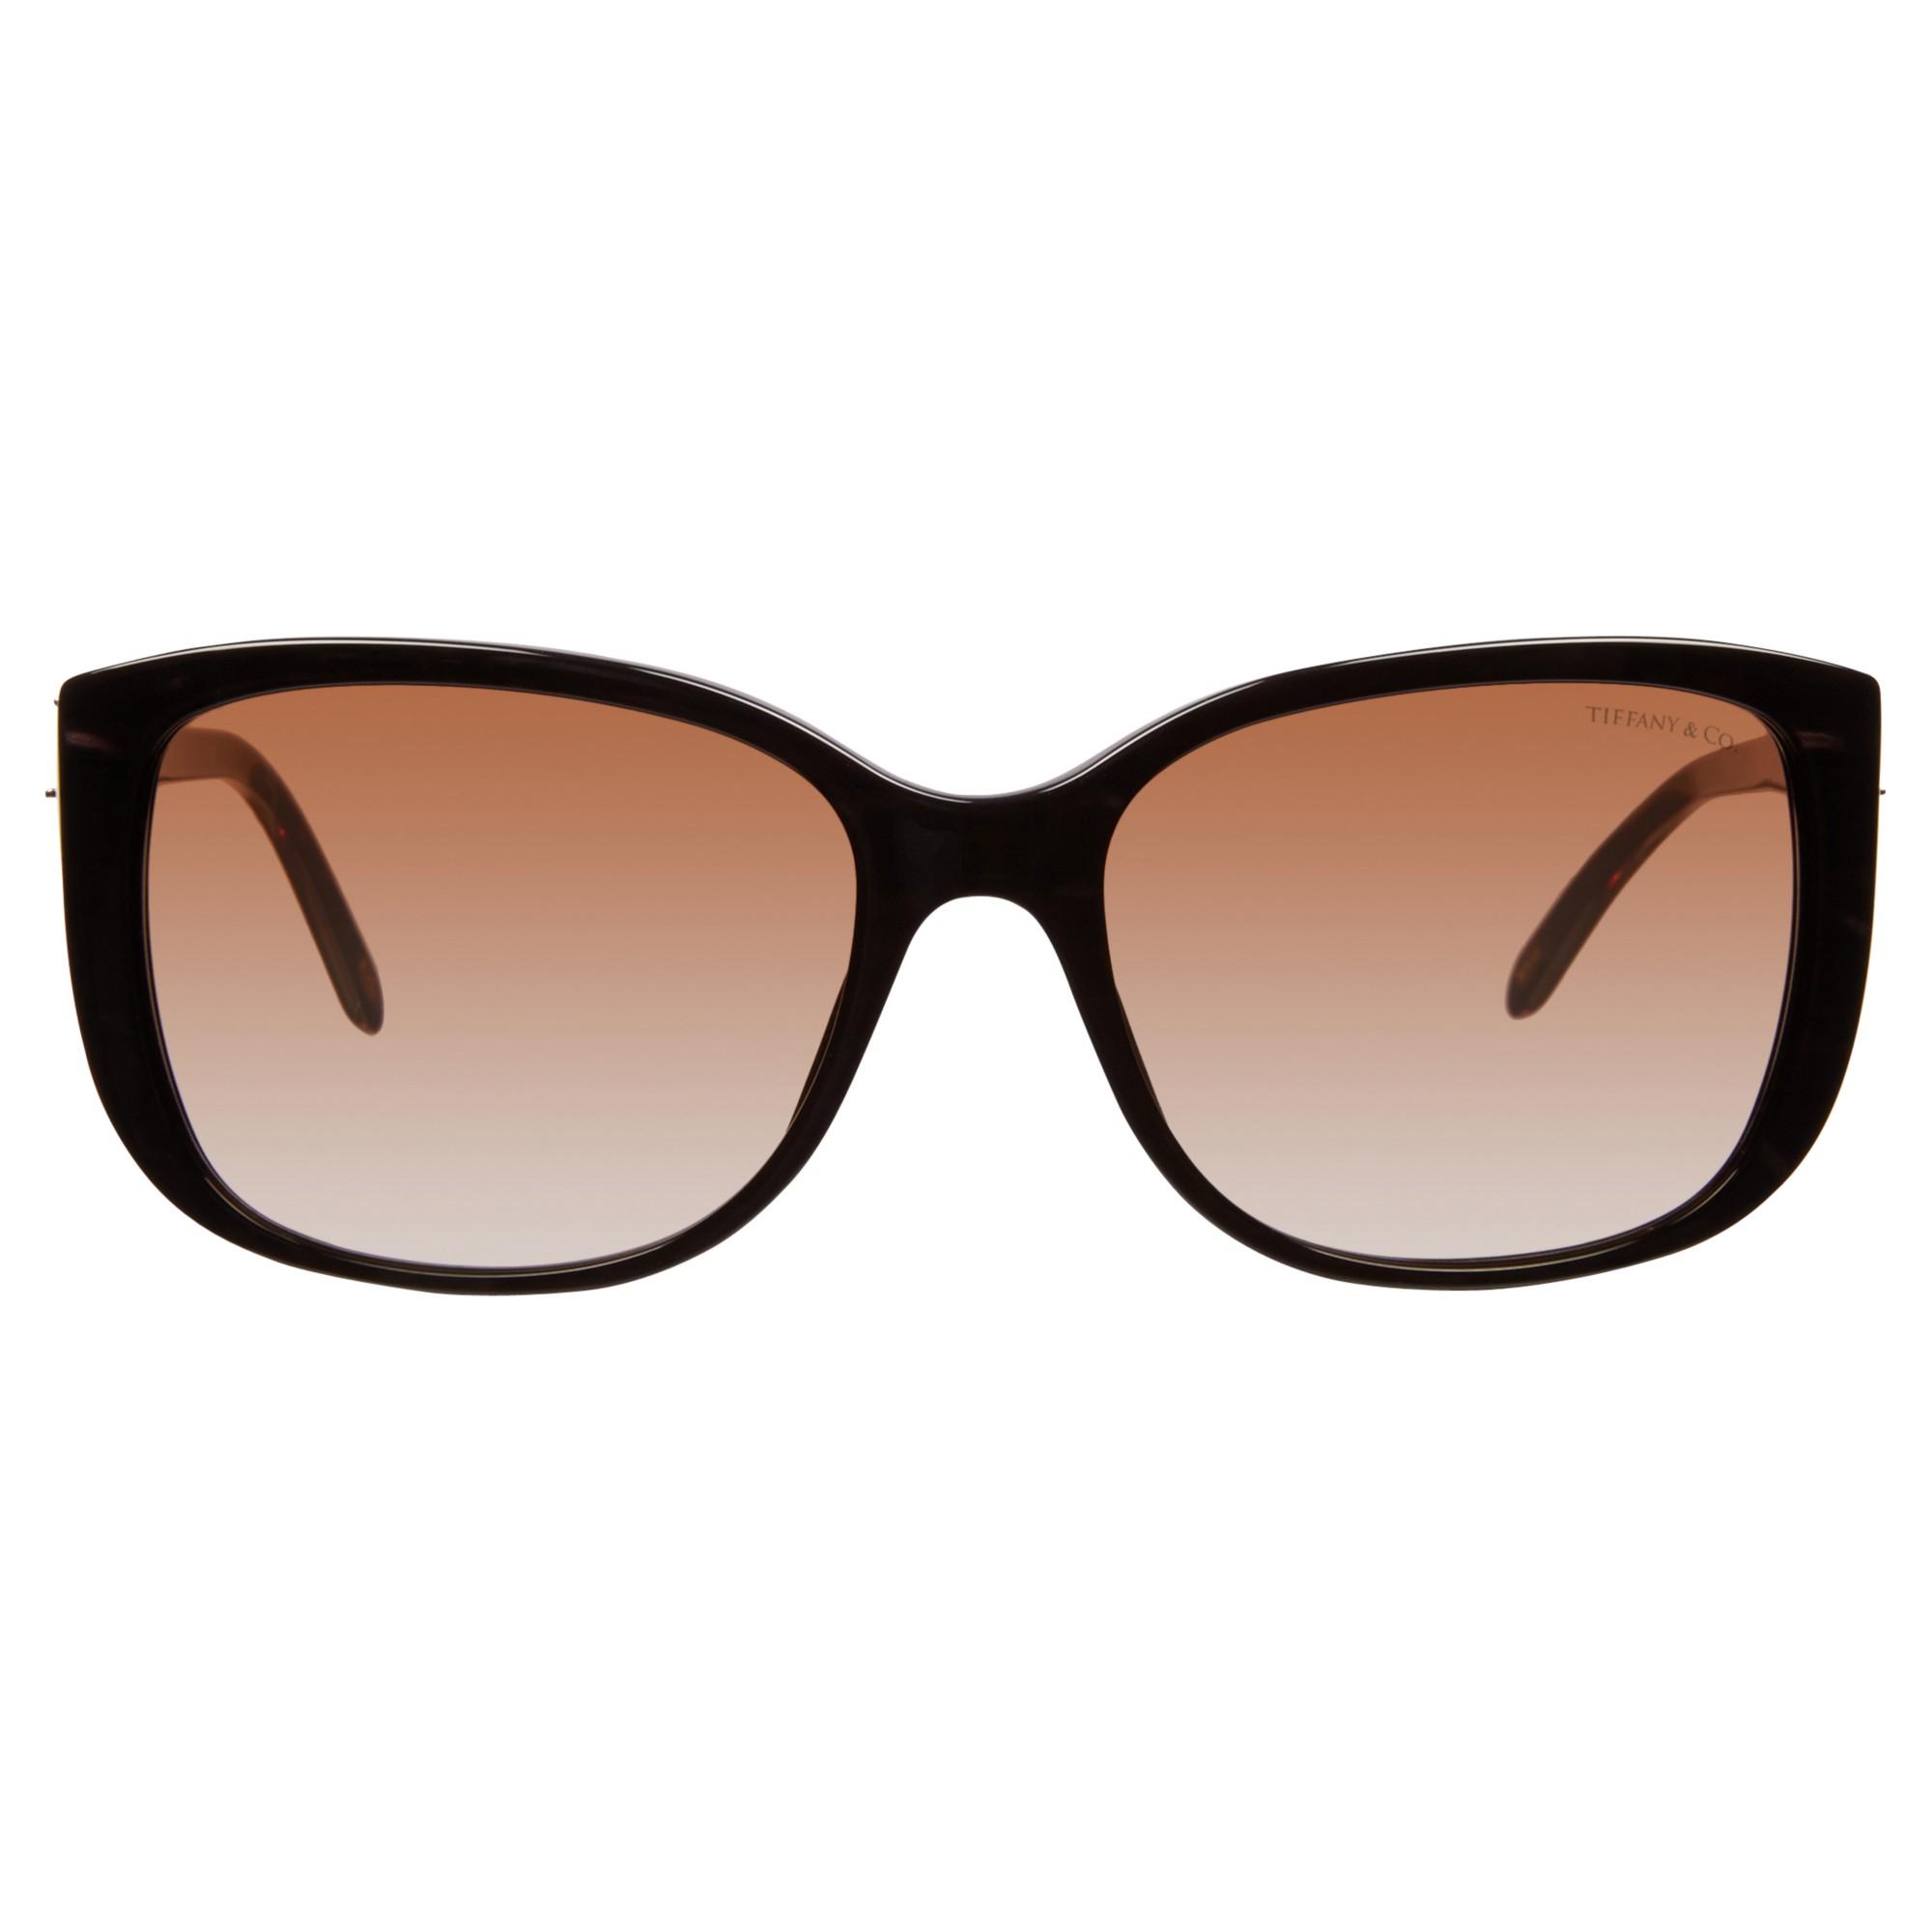 79fd378a6bf3 Tiffany   Co. Tf4090b Square Sunglasses in Brown - Lyst